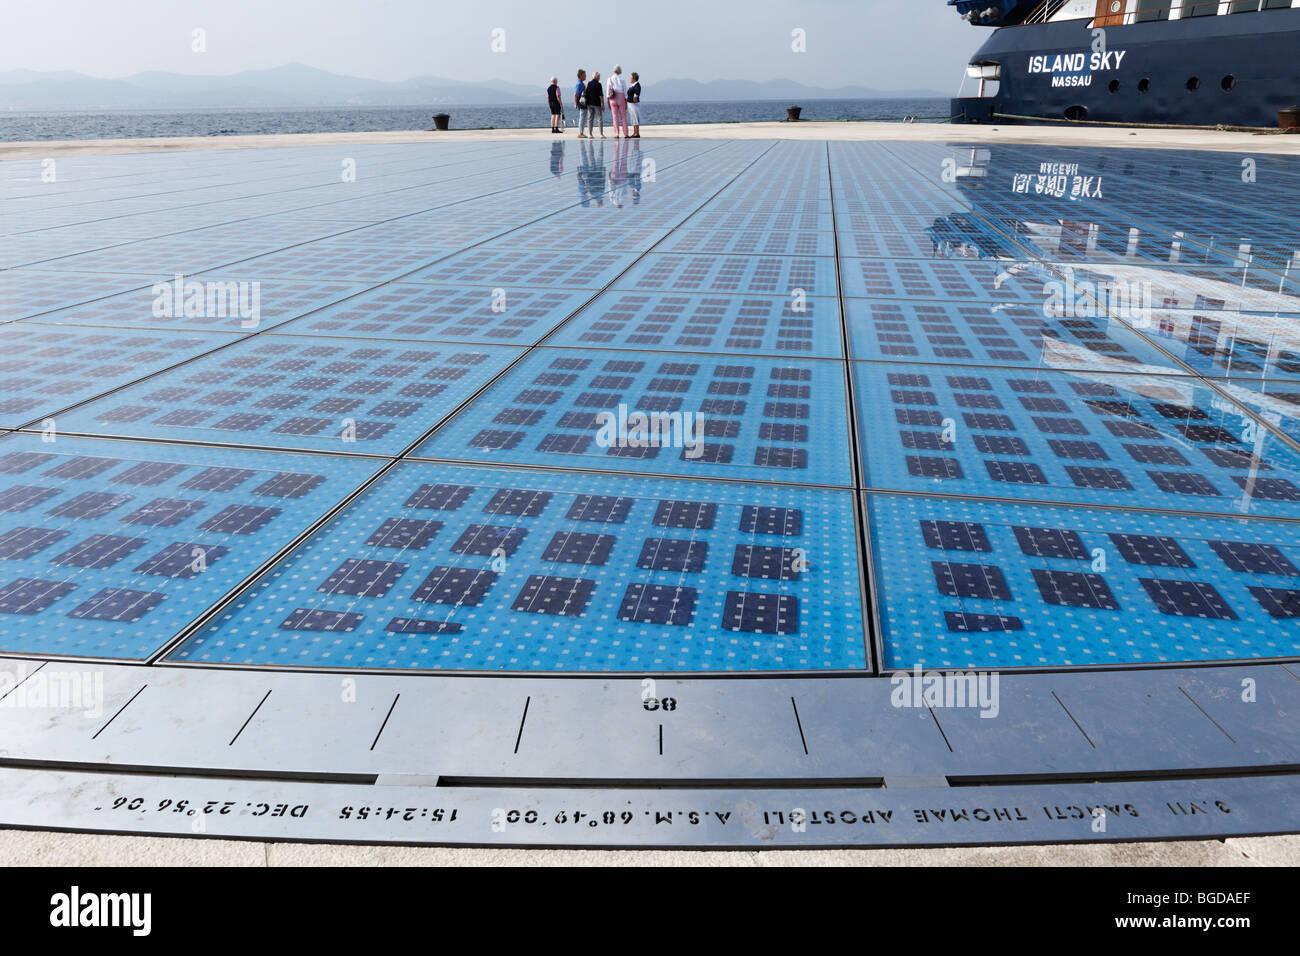 The Greeting to the Sun, art work by Nikola Basic, Zadar, Dalmatia, Adriatic, Croatia, Europe - Stock Image